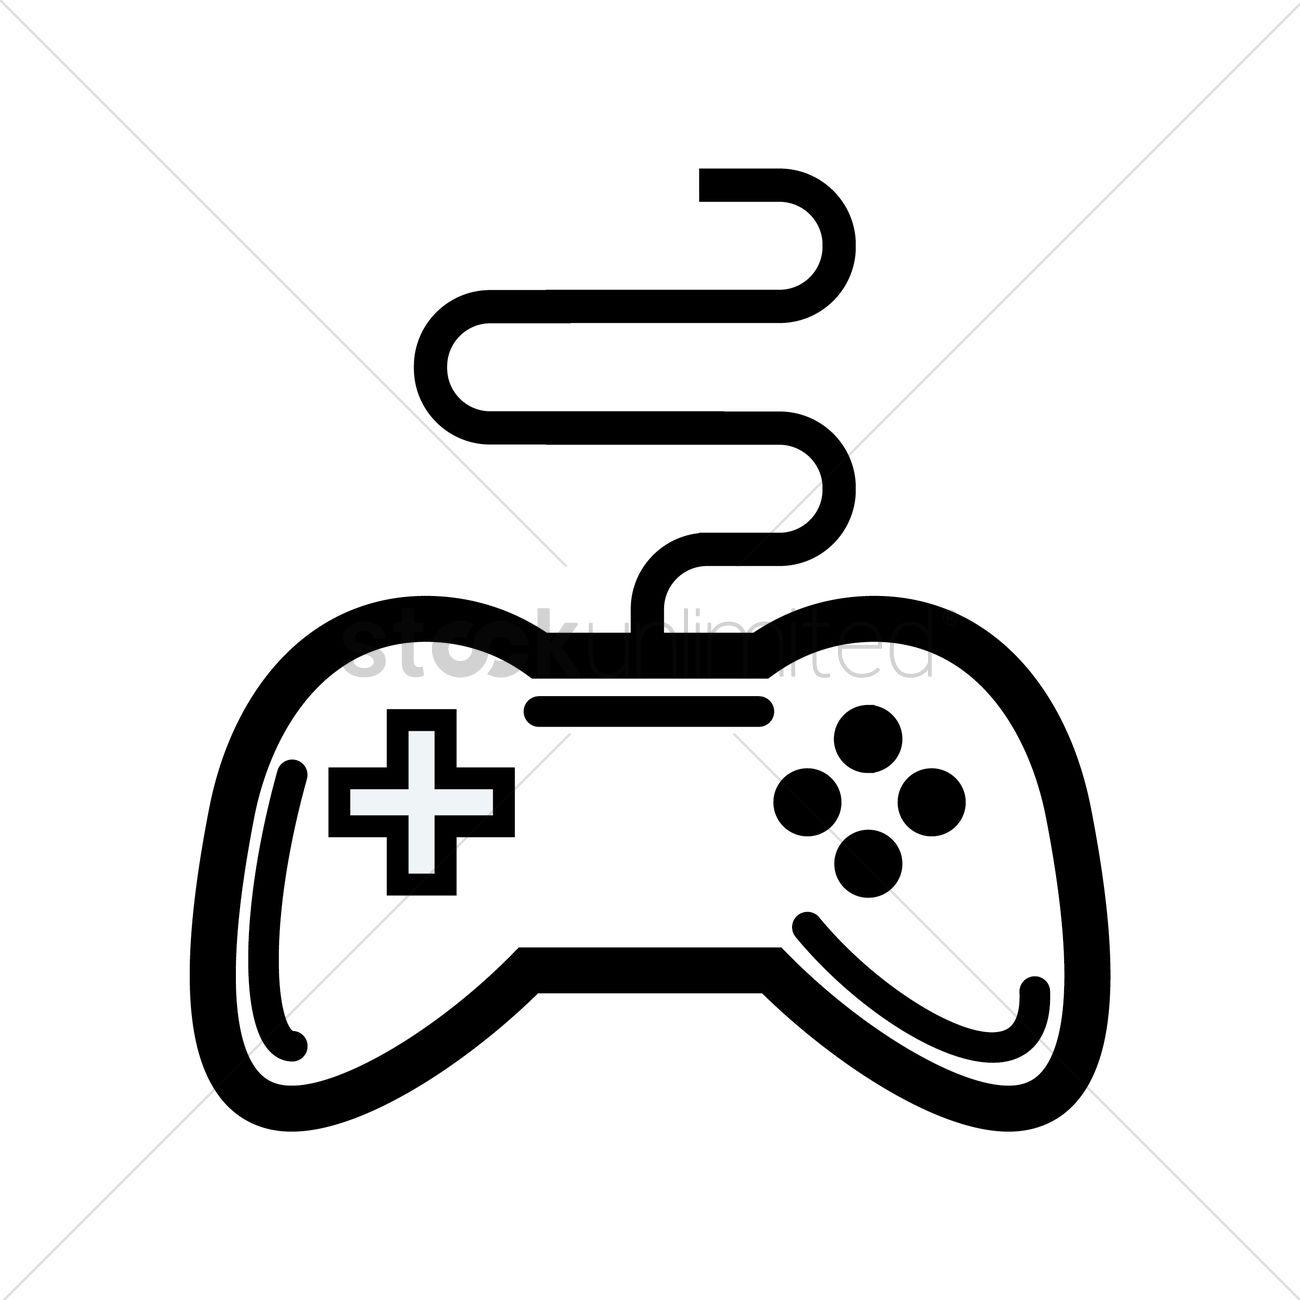 Game Controller Vector At Vectorified